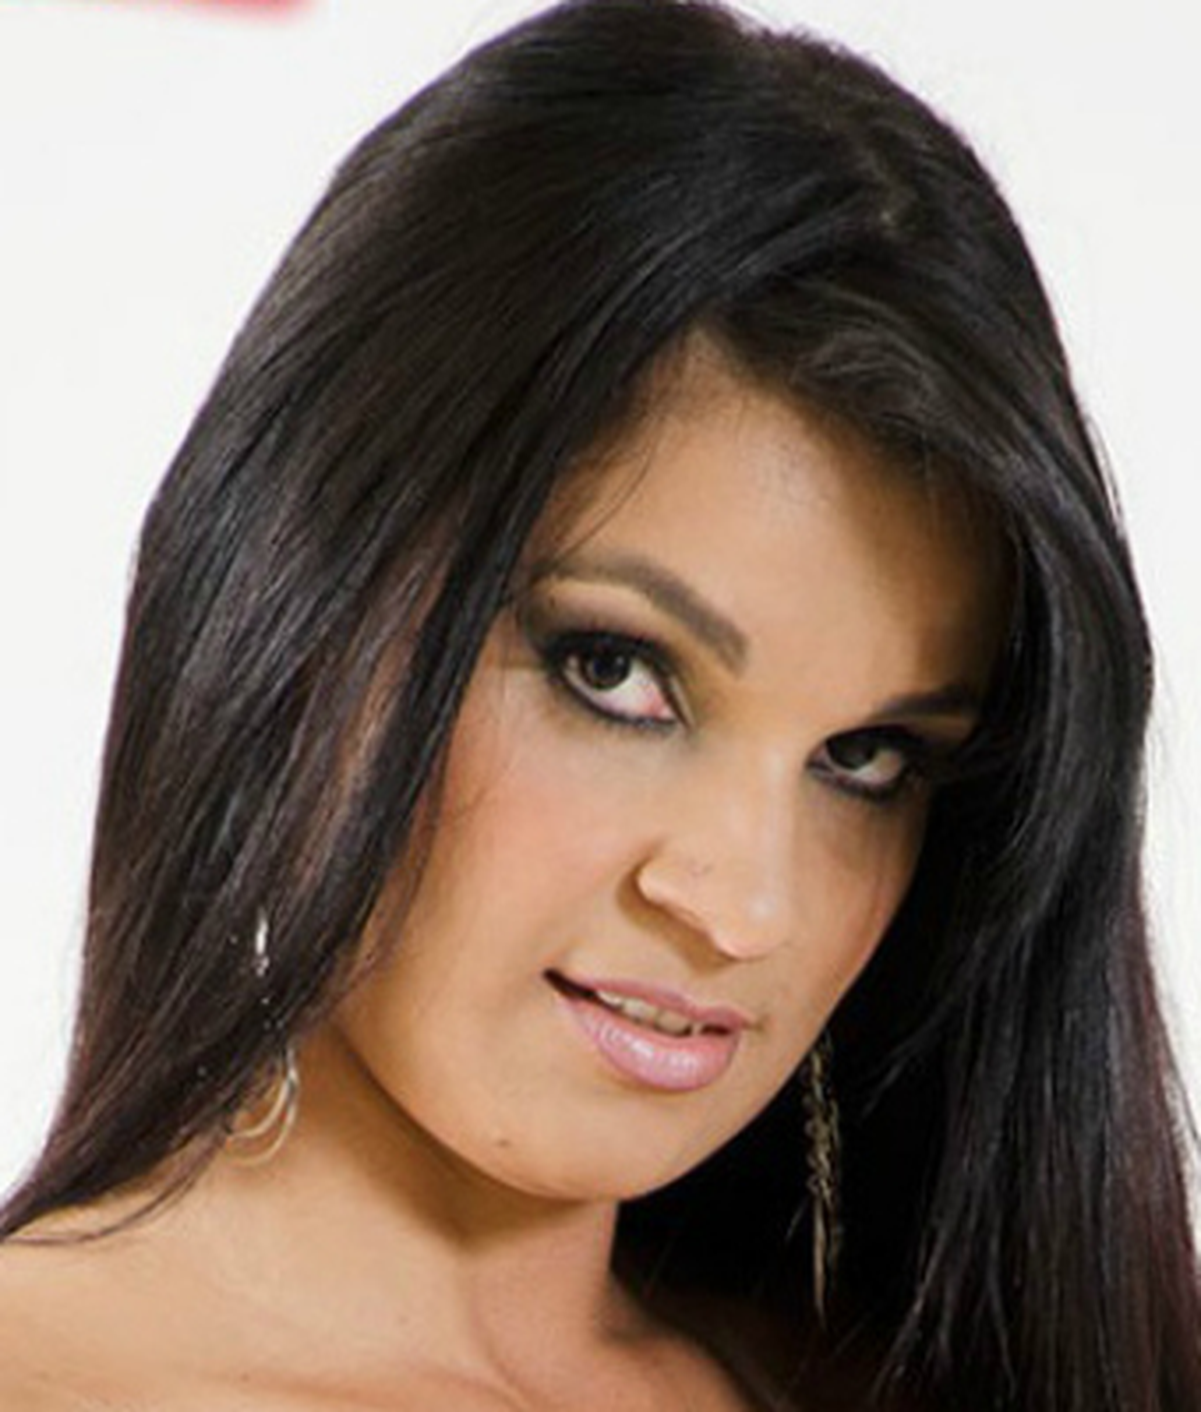 Cristine Castellary